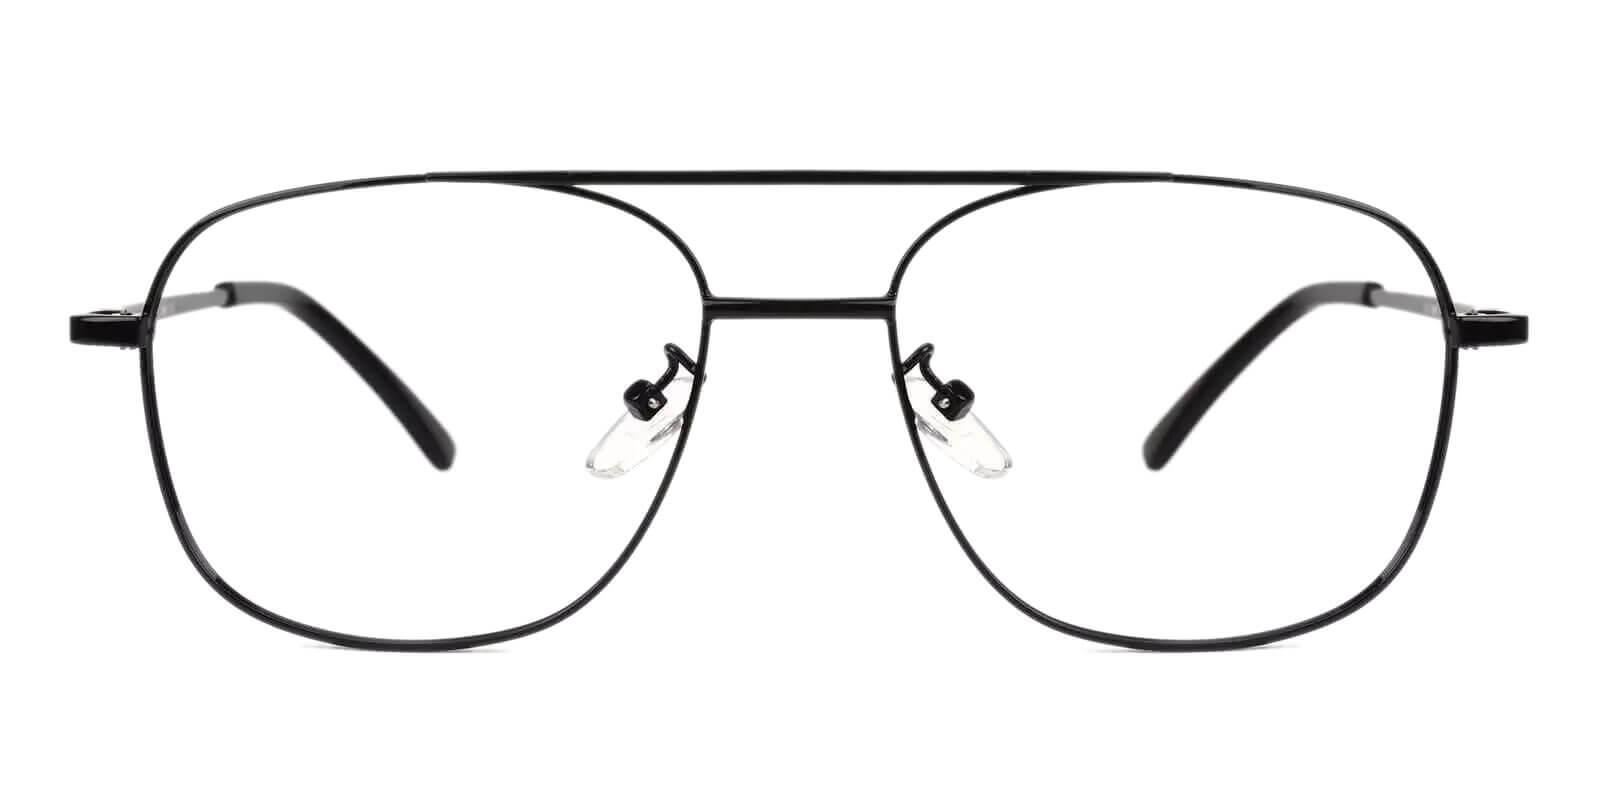 Gatewood Black Metal Eyeglasses , NosePads , SpringHinges Frames from ABBE Glasses